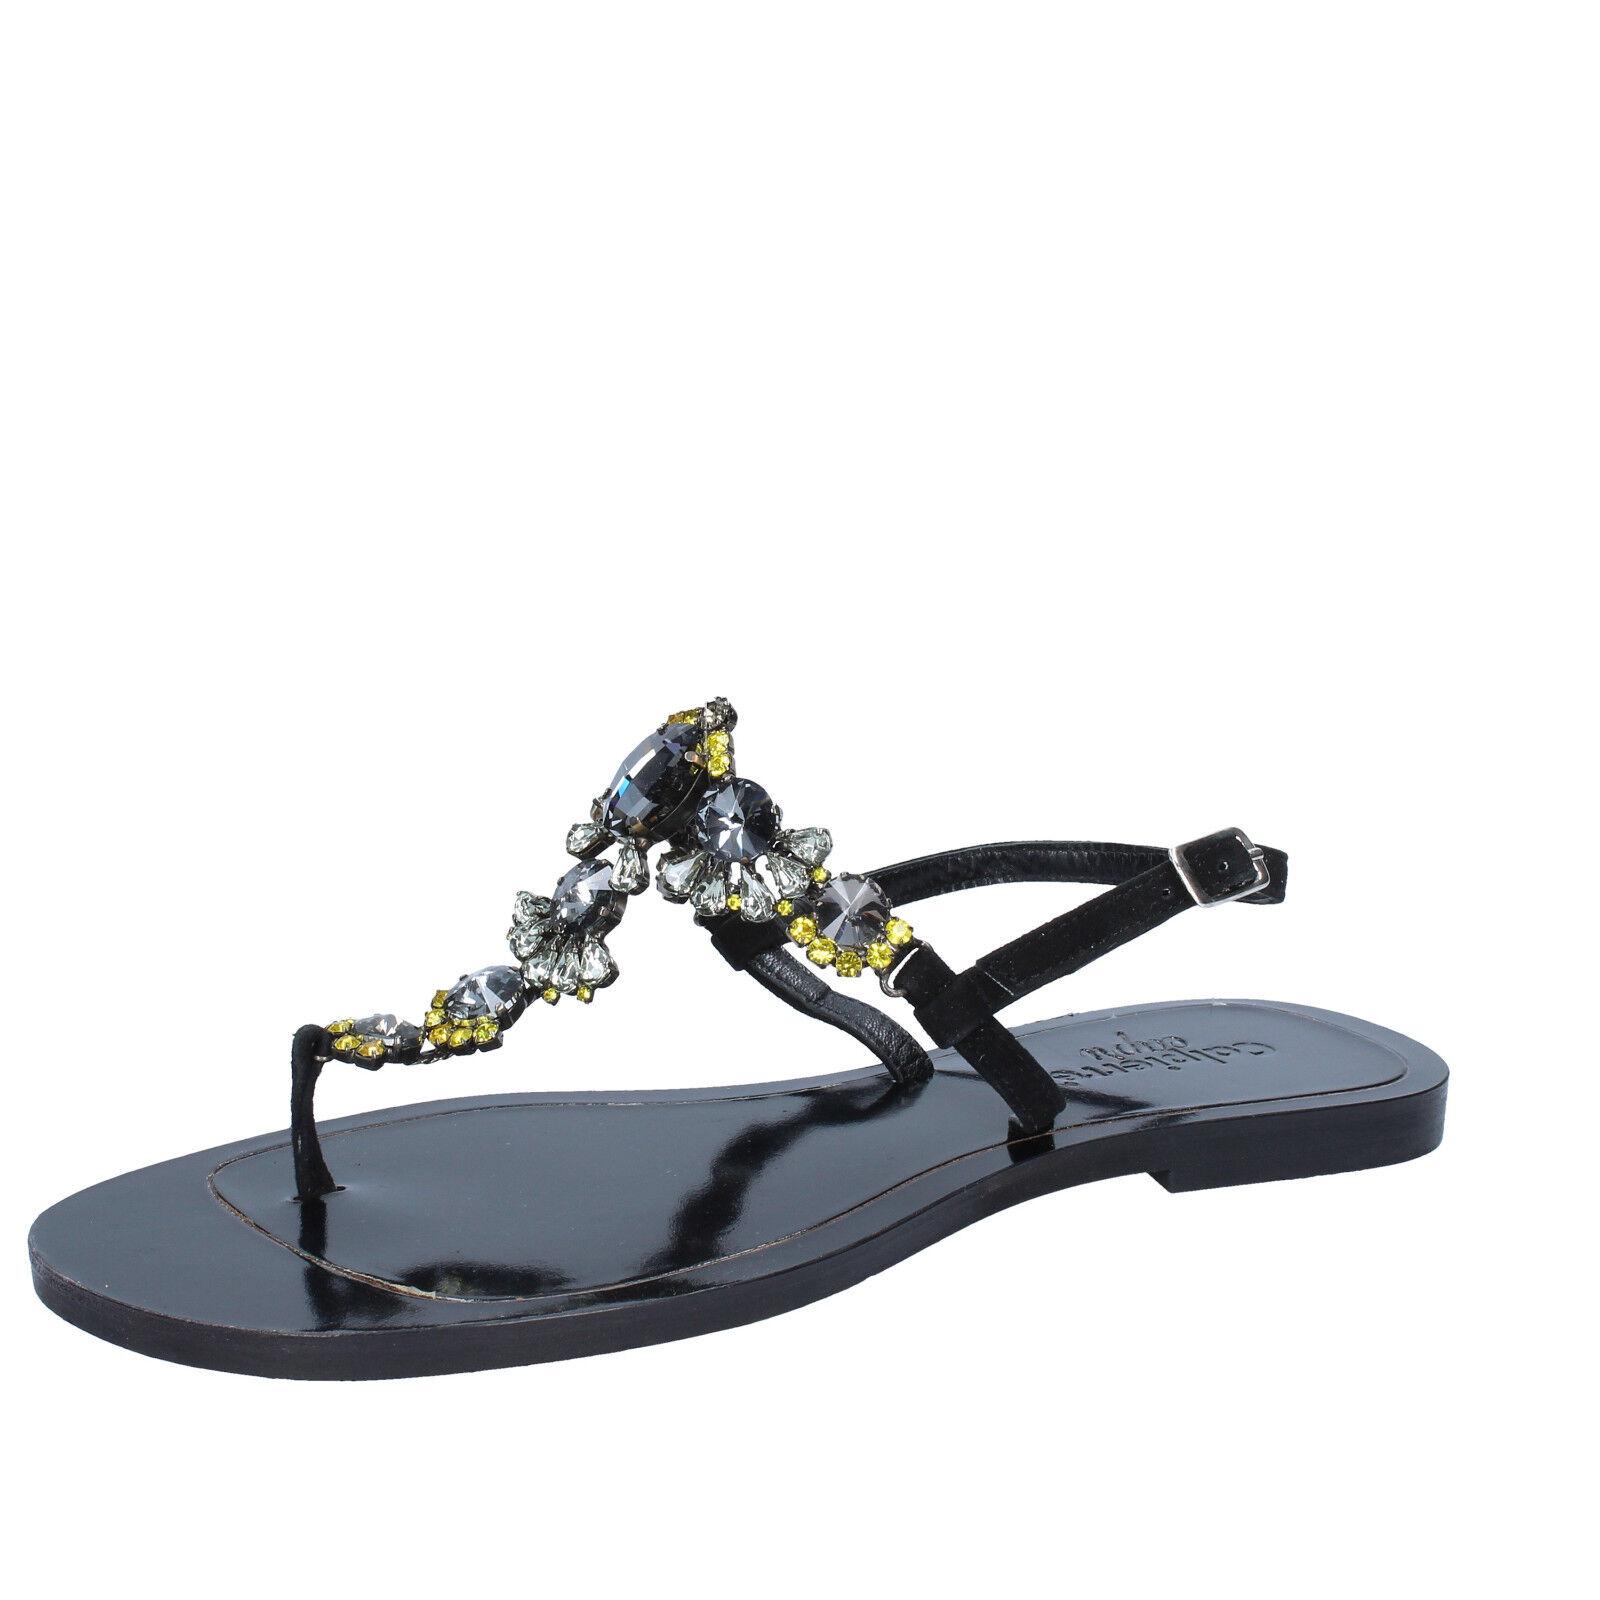 Scarpe donna CALPIERRE 36 EU sandali nero camoscio BZ879-B